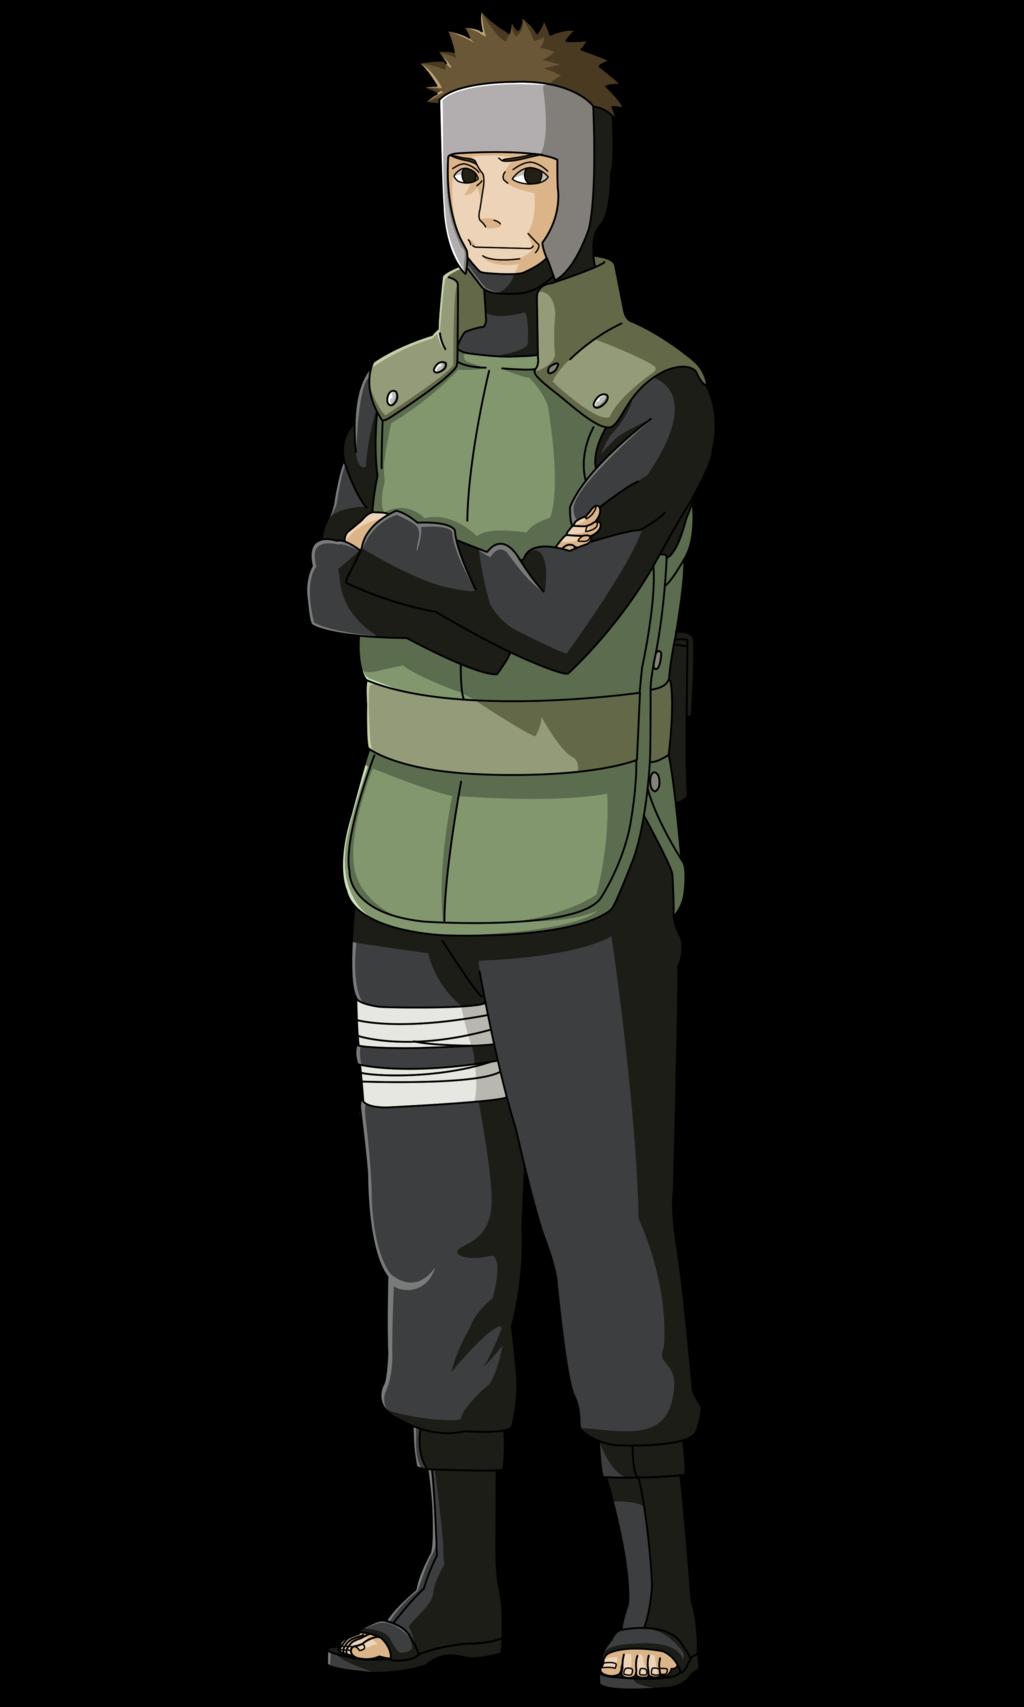 Imagem yamato boruto render png wikia liber - Yamato render ...